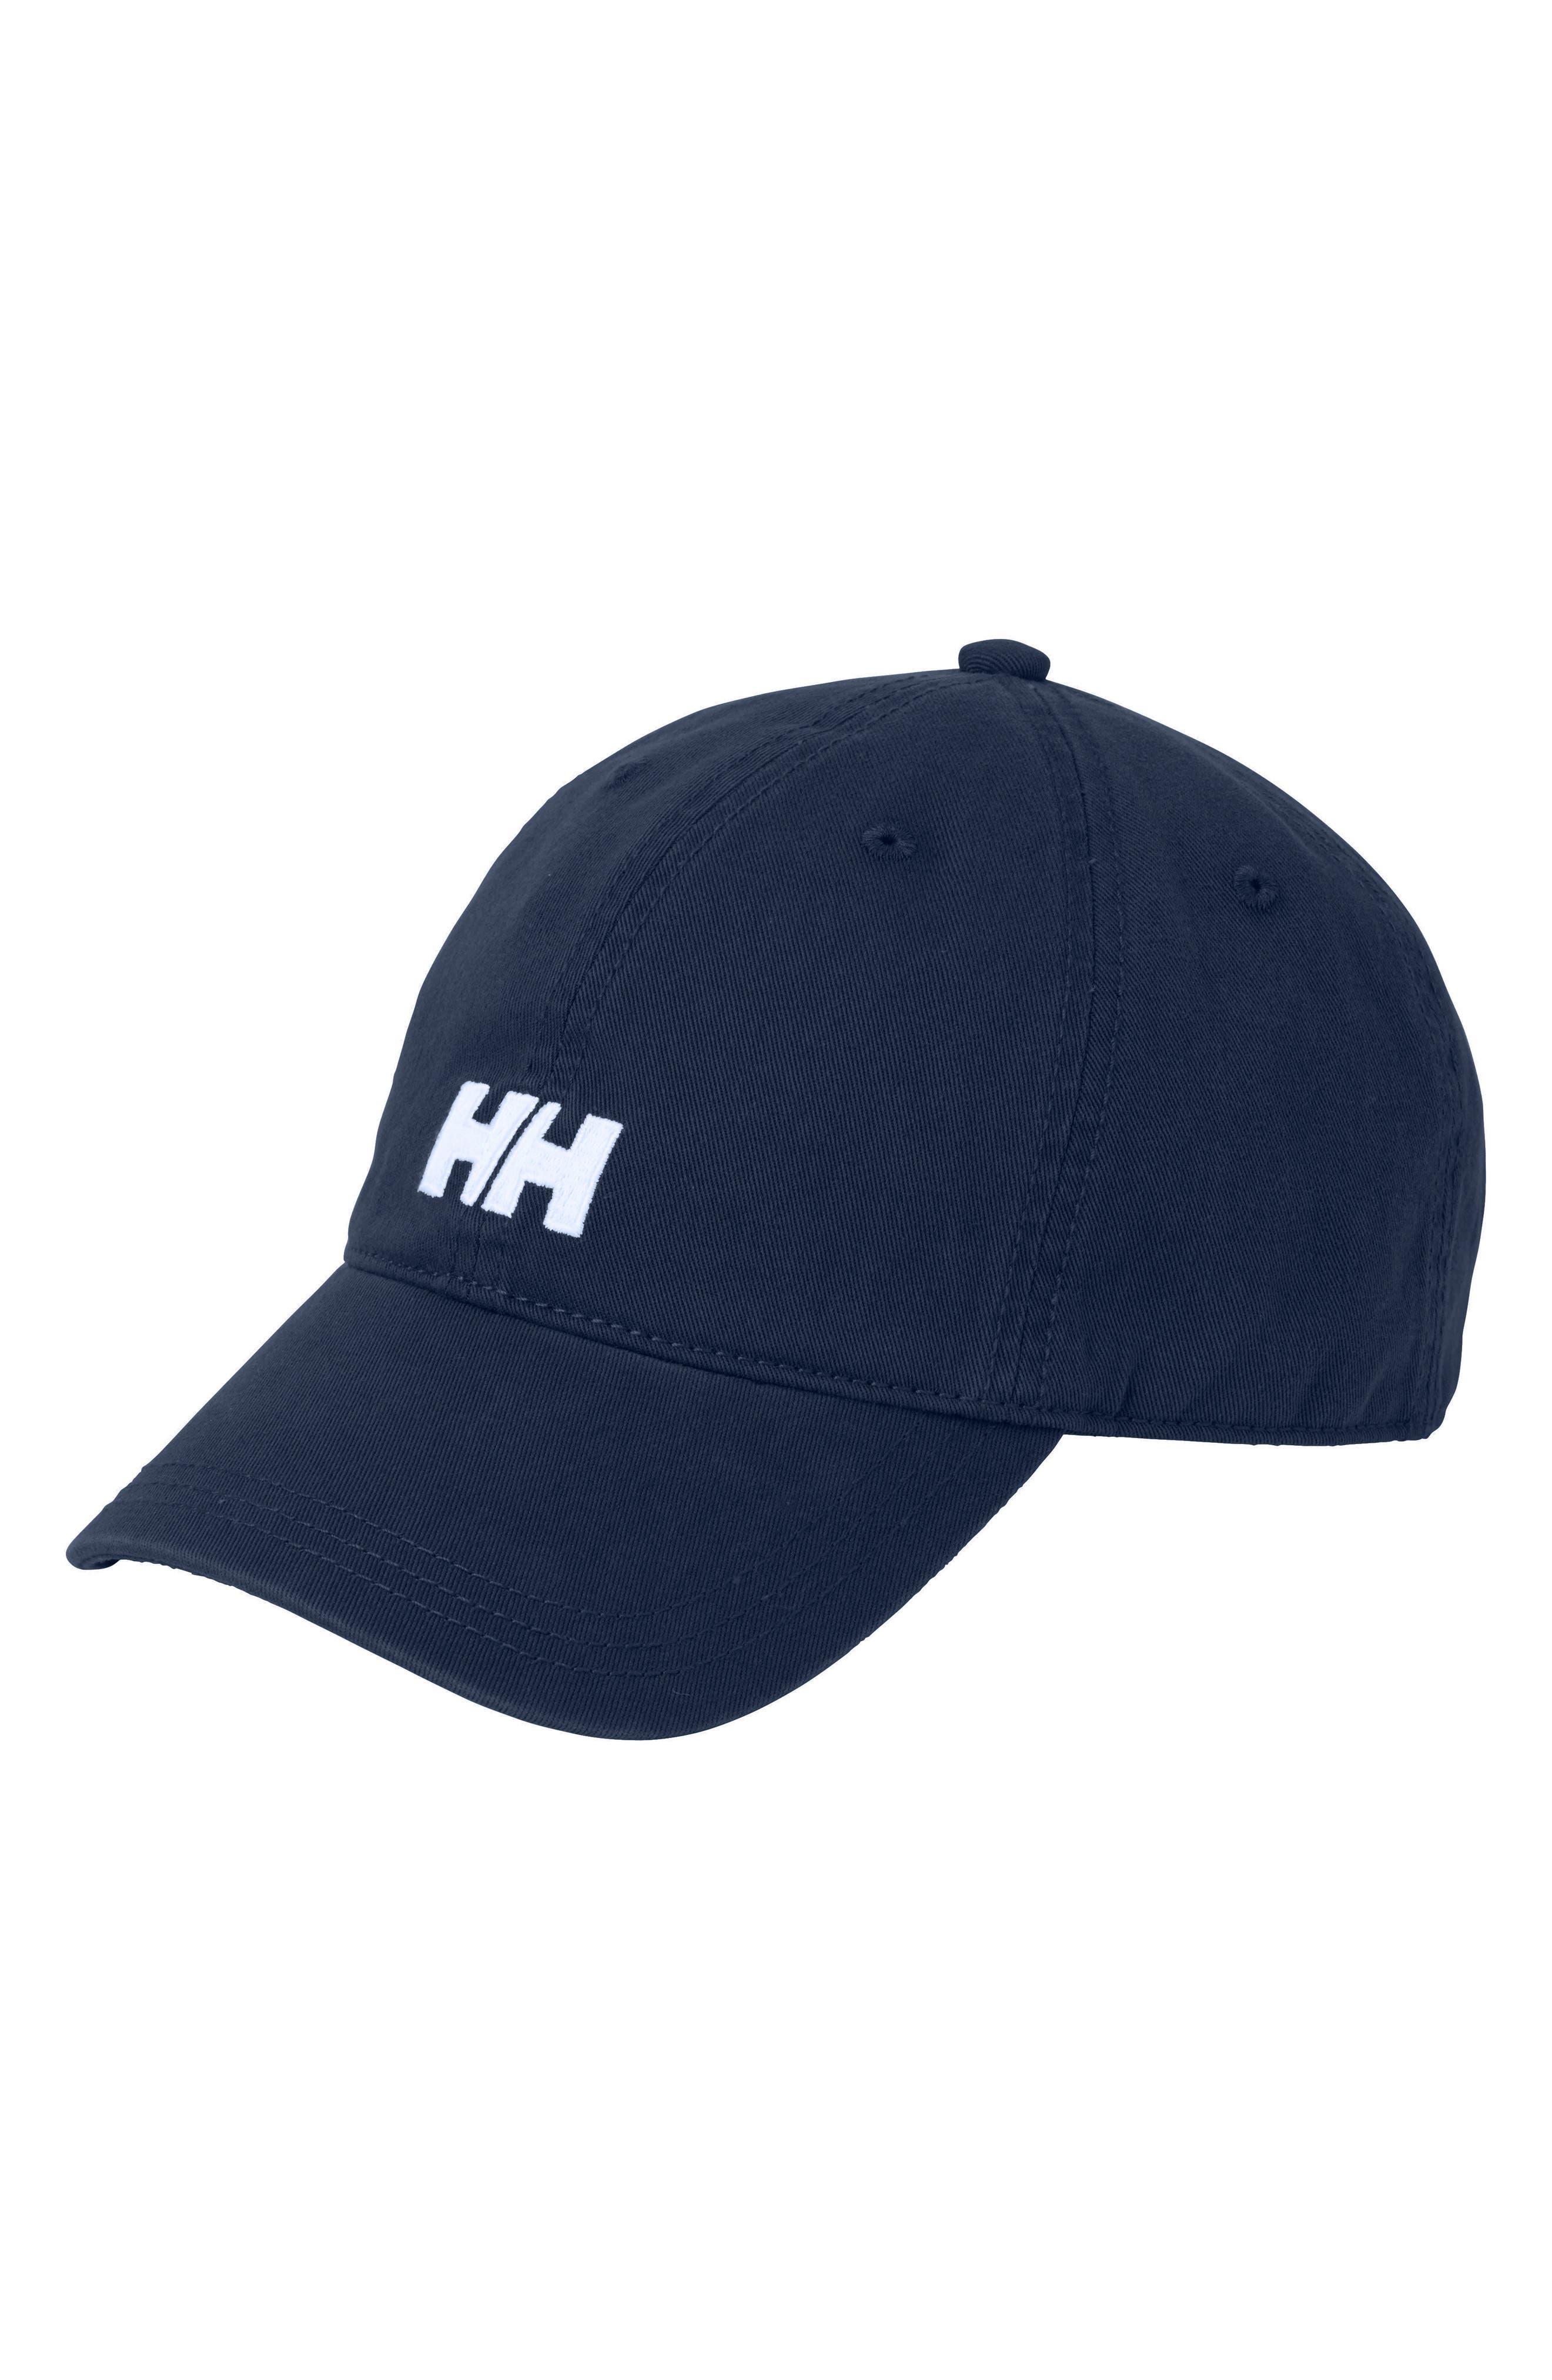 Main Image - Helly Hansen Logo Baseball Cap